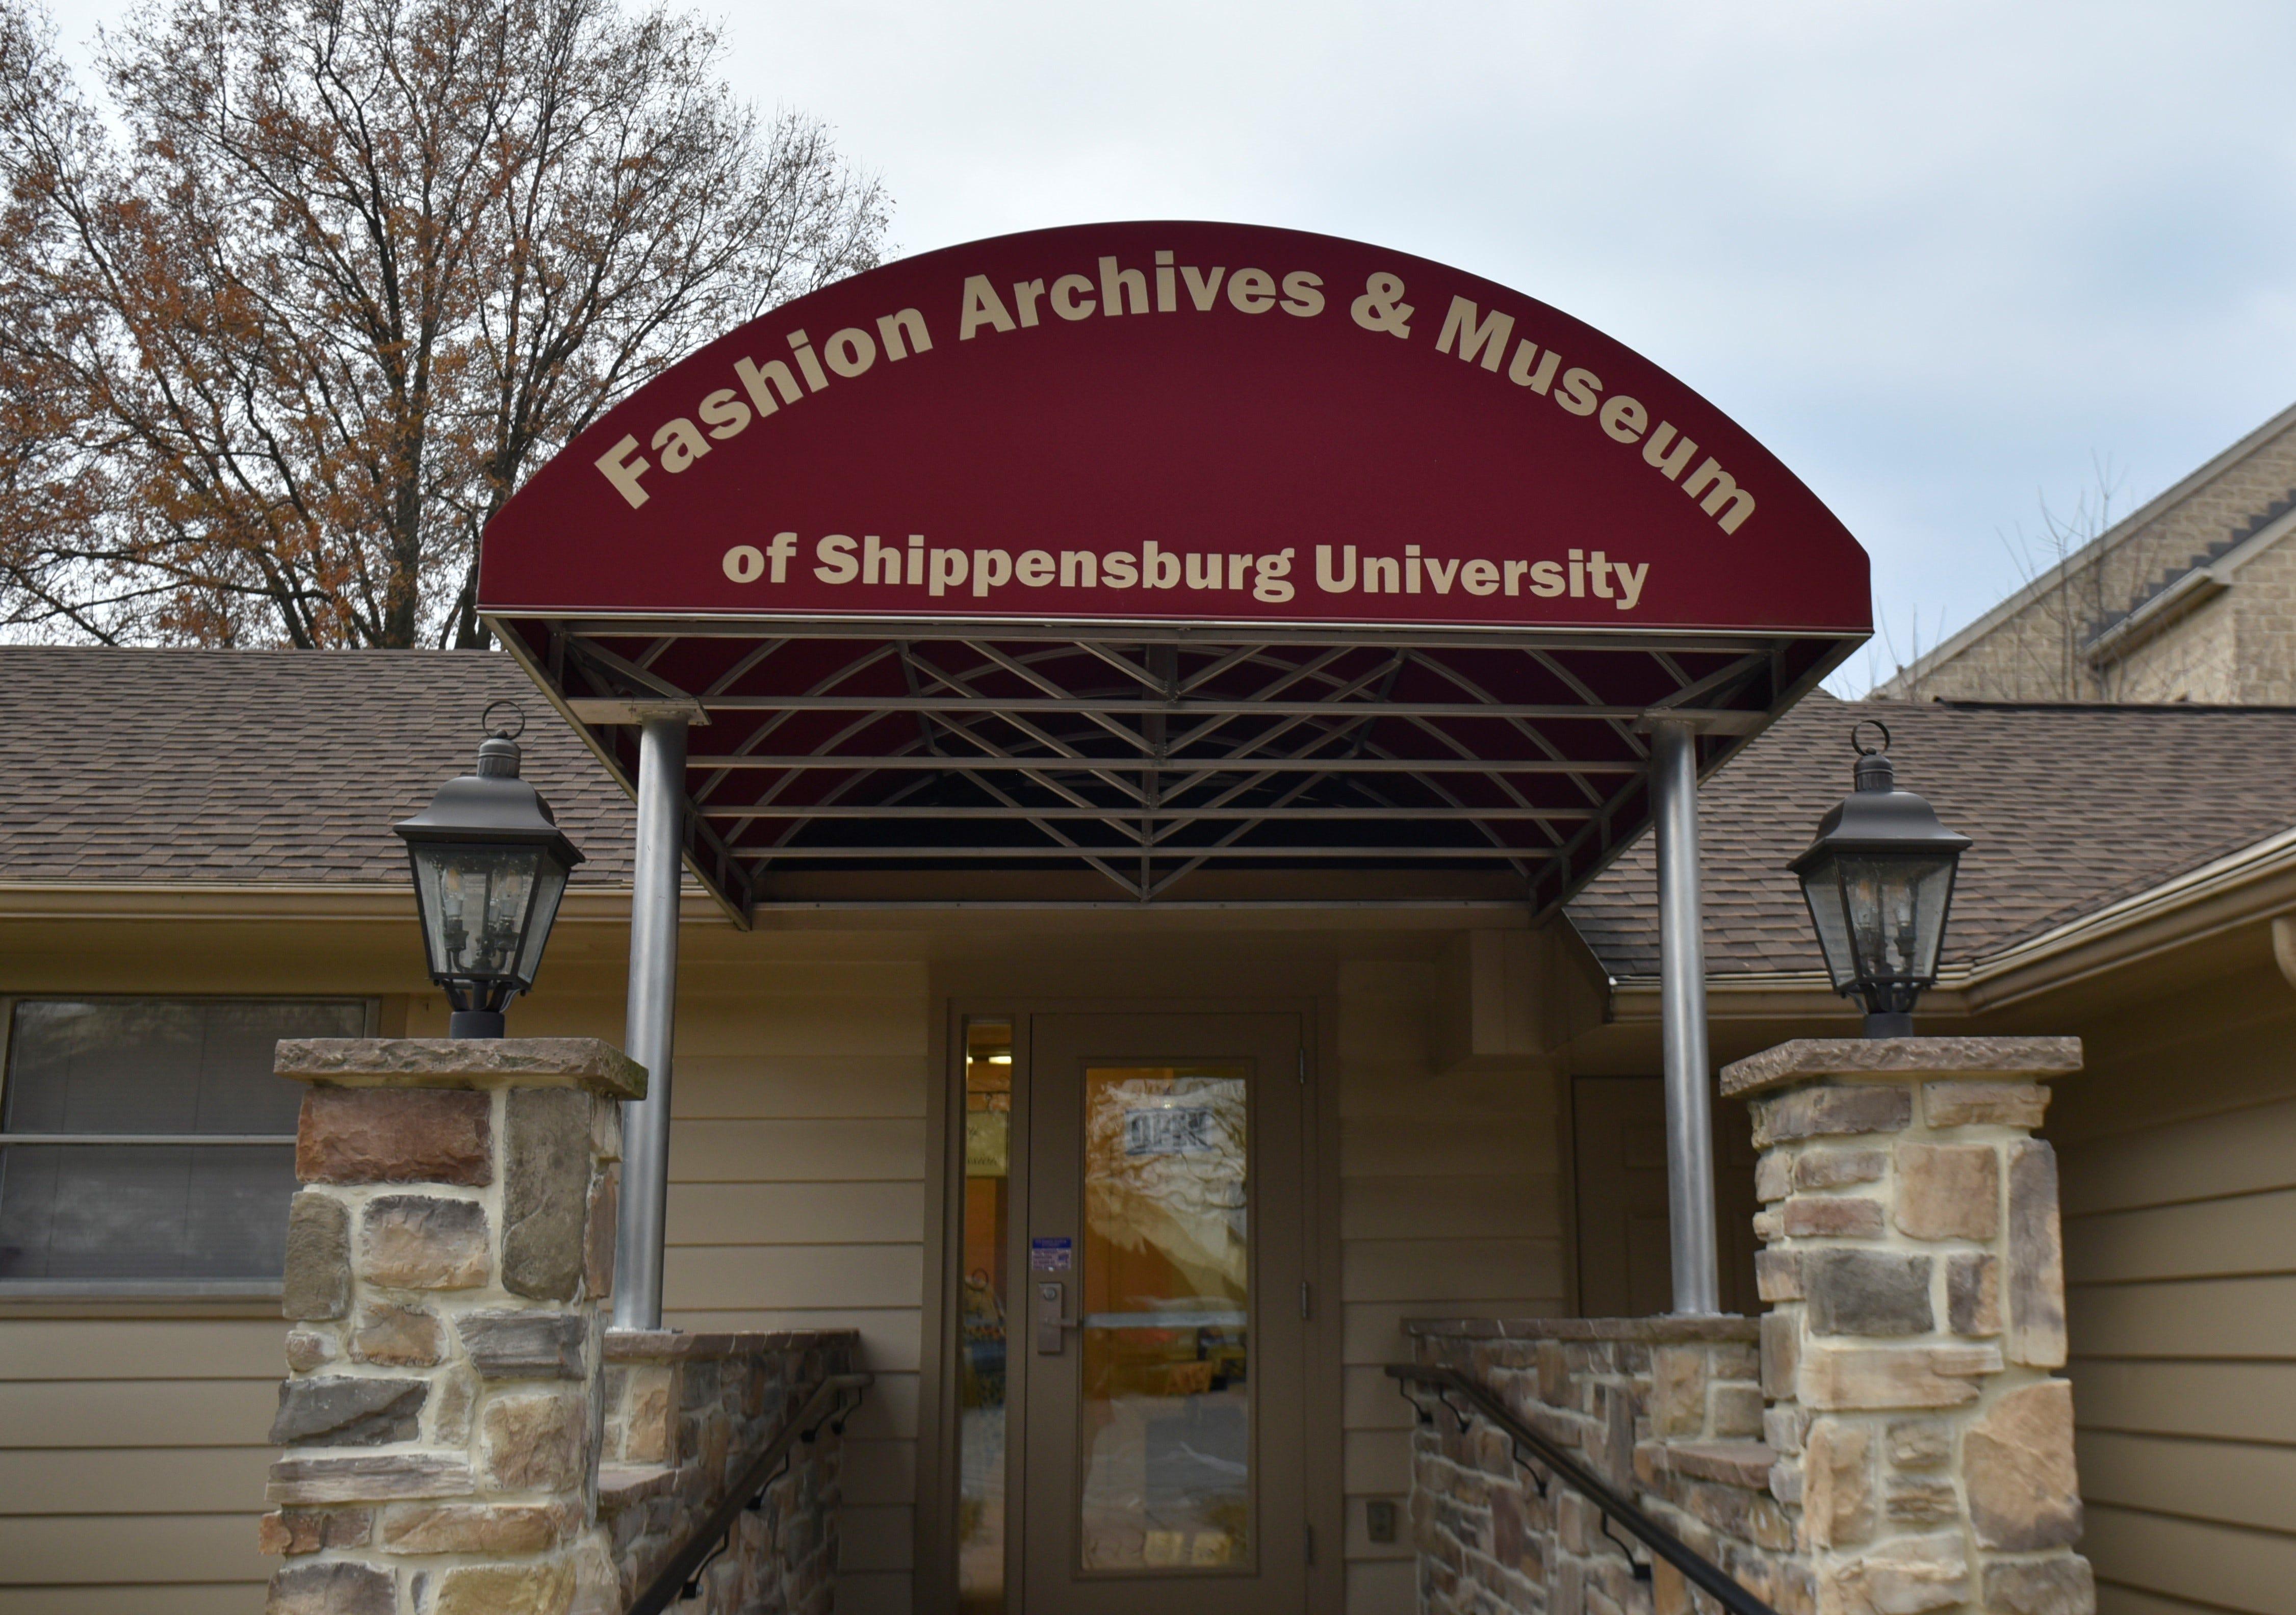 Shippensburg universitet dating